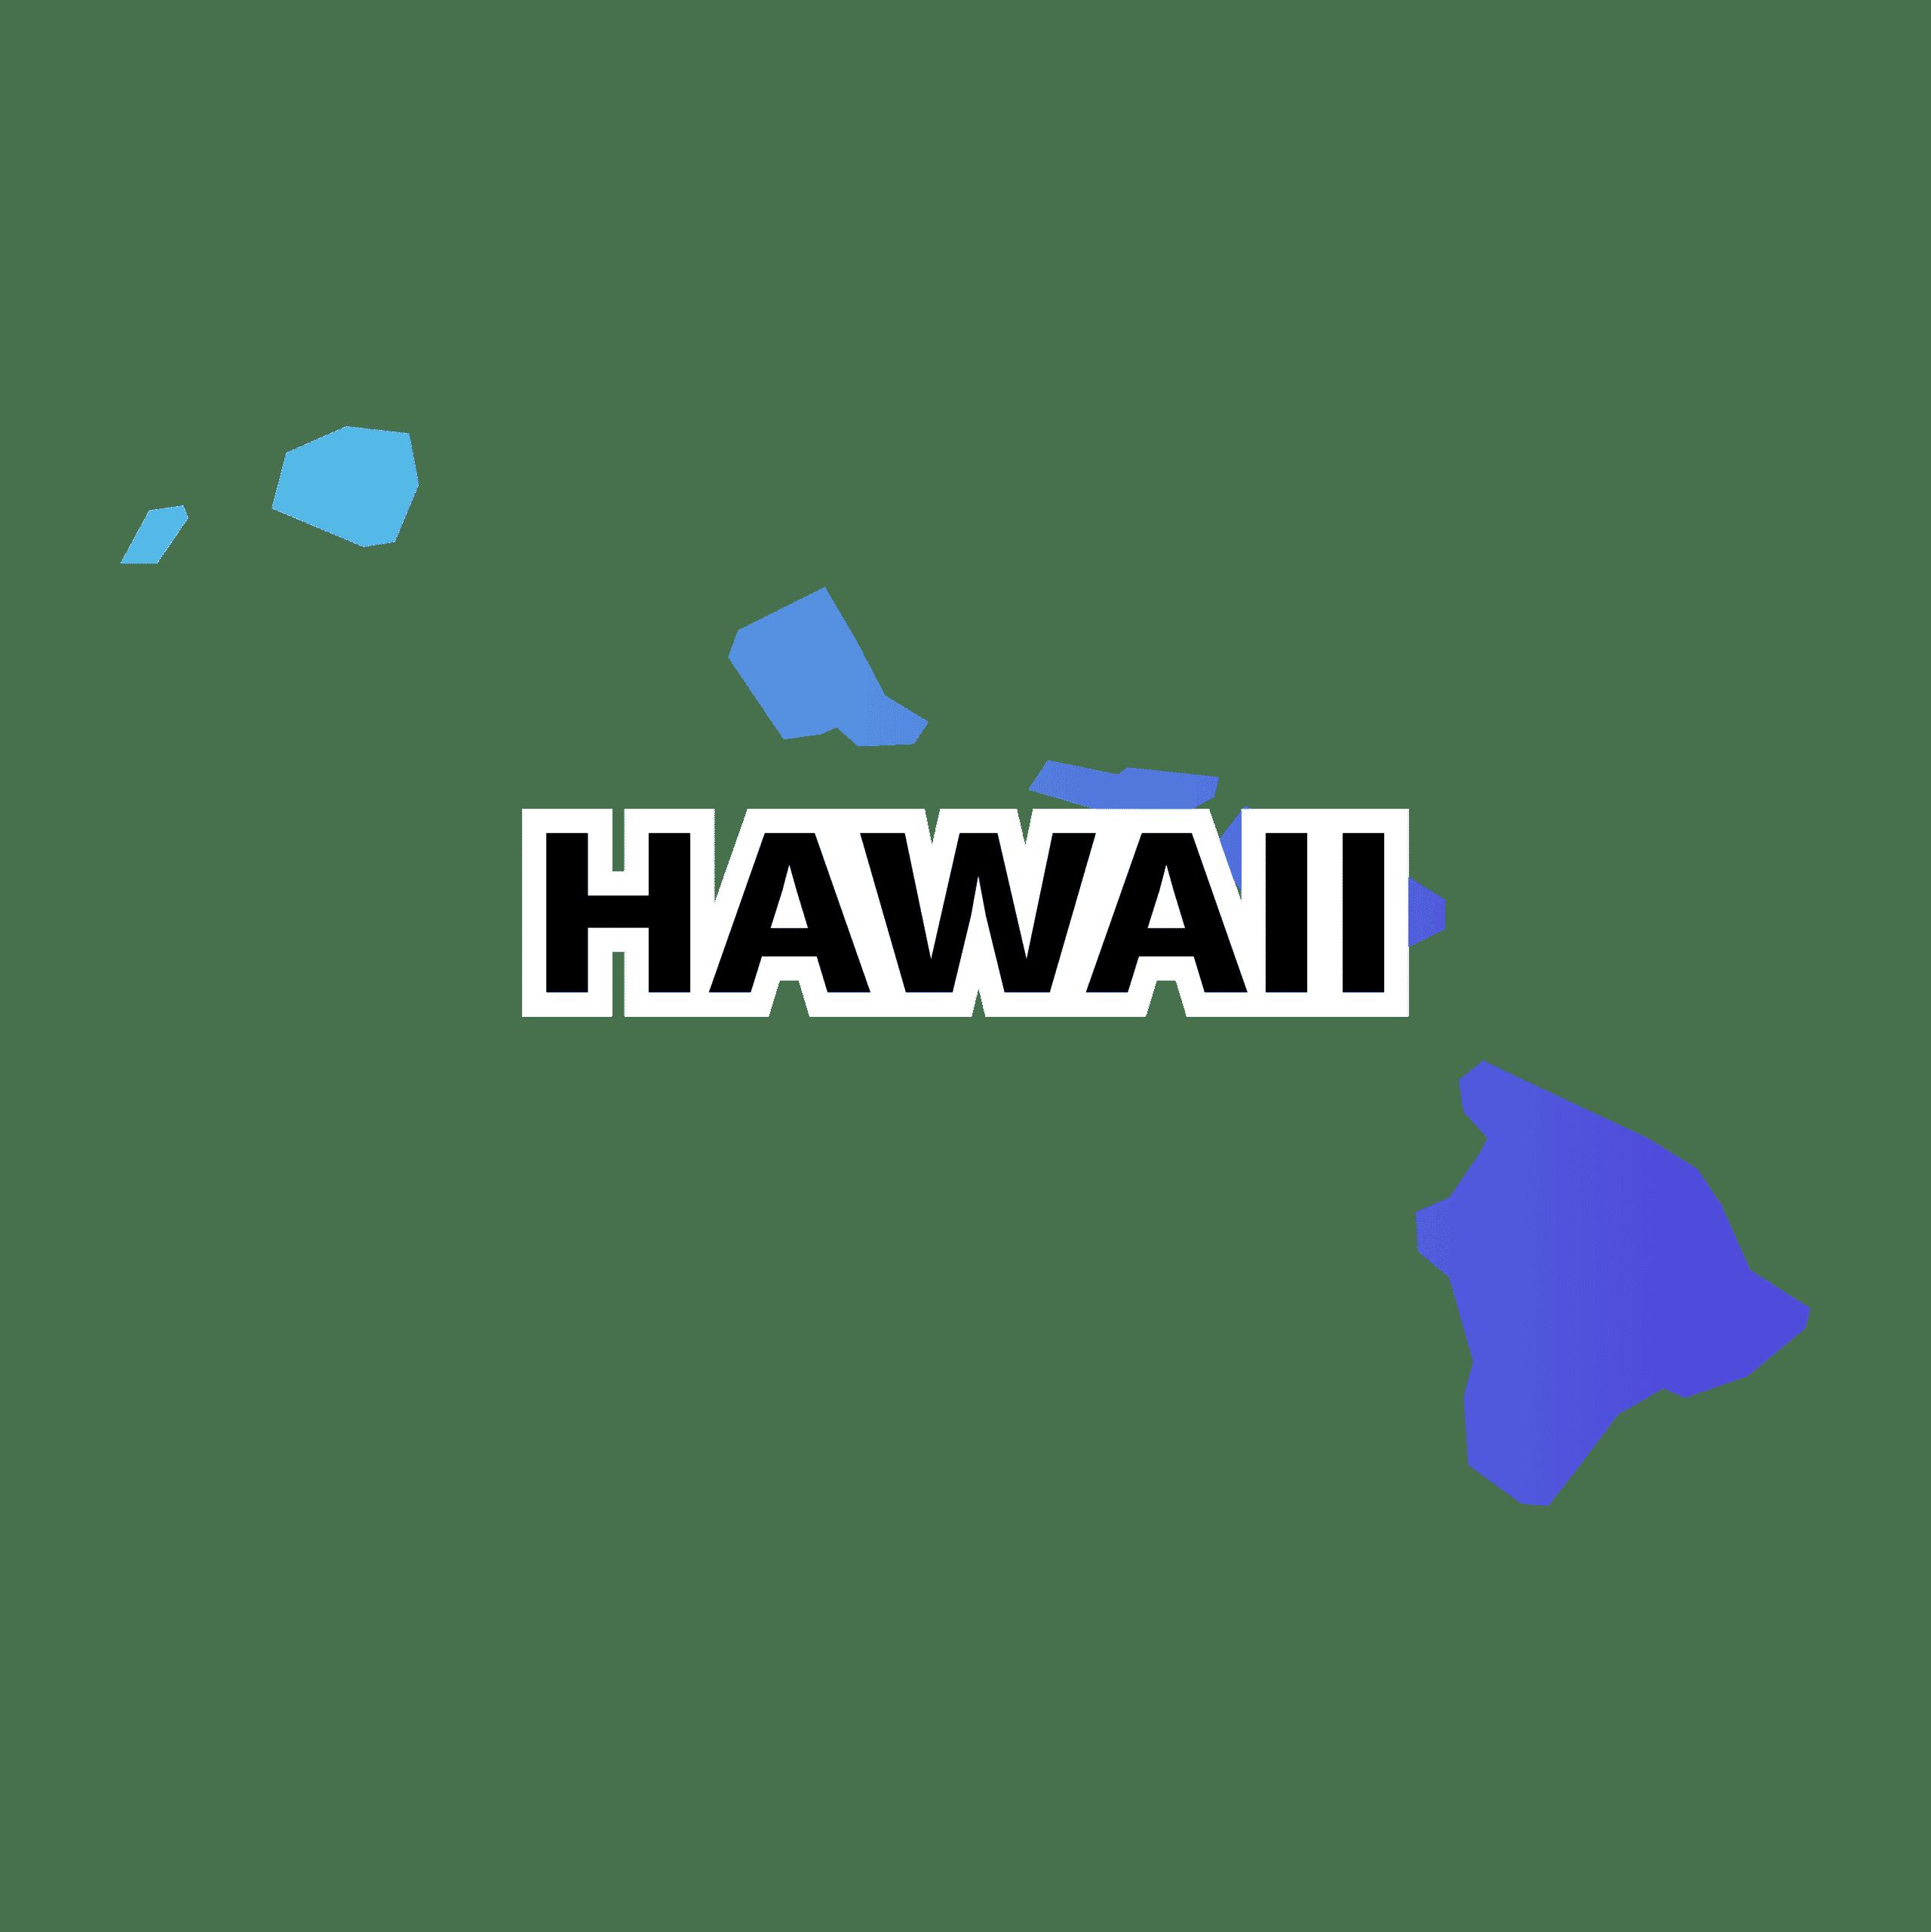 Hawaii State Image